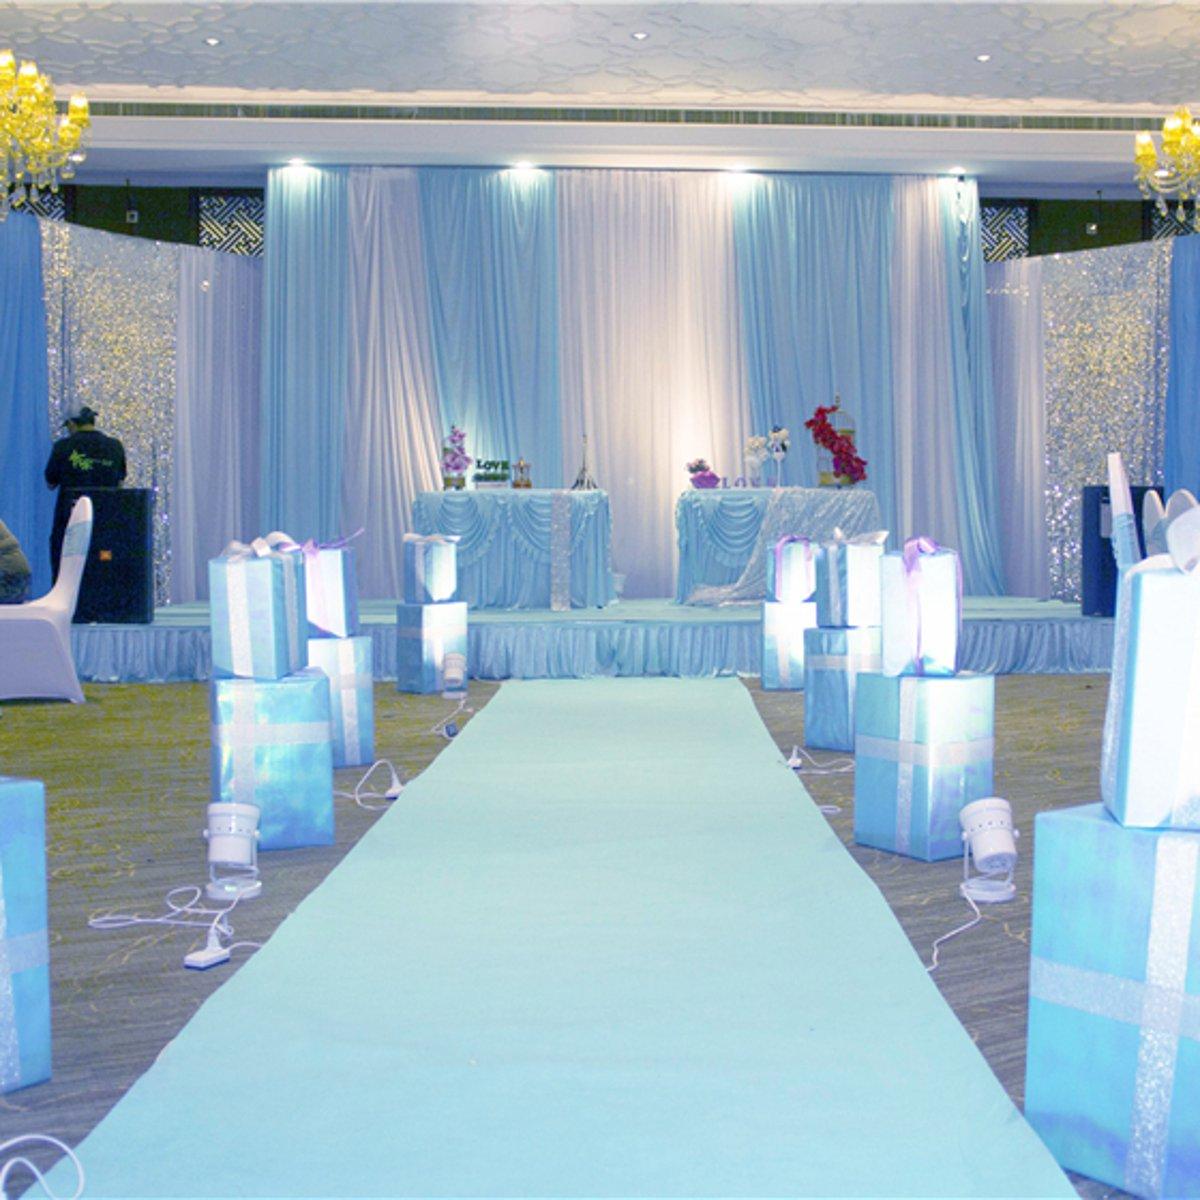 White Carpet 10x1m Wedding Aisle Floor Runner Hollywood Awards Party  Decoration Polyester Floor Rug Runner Party